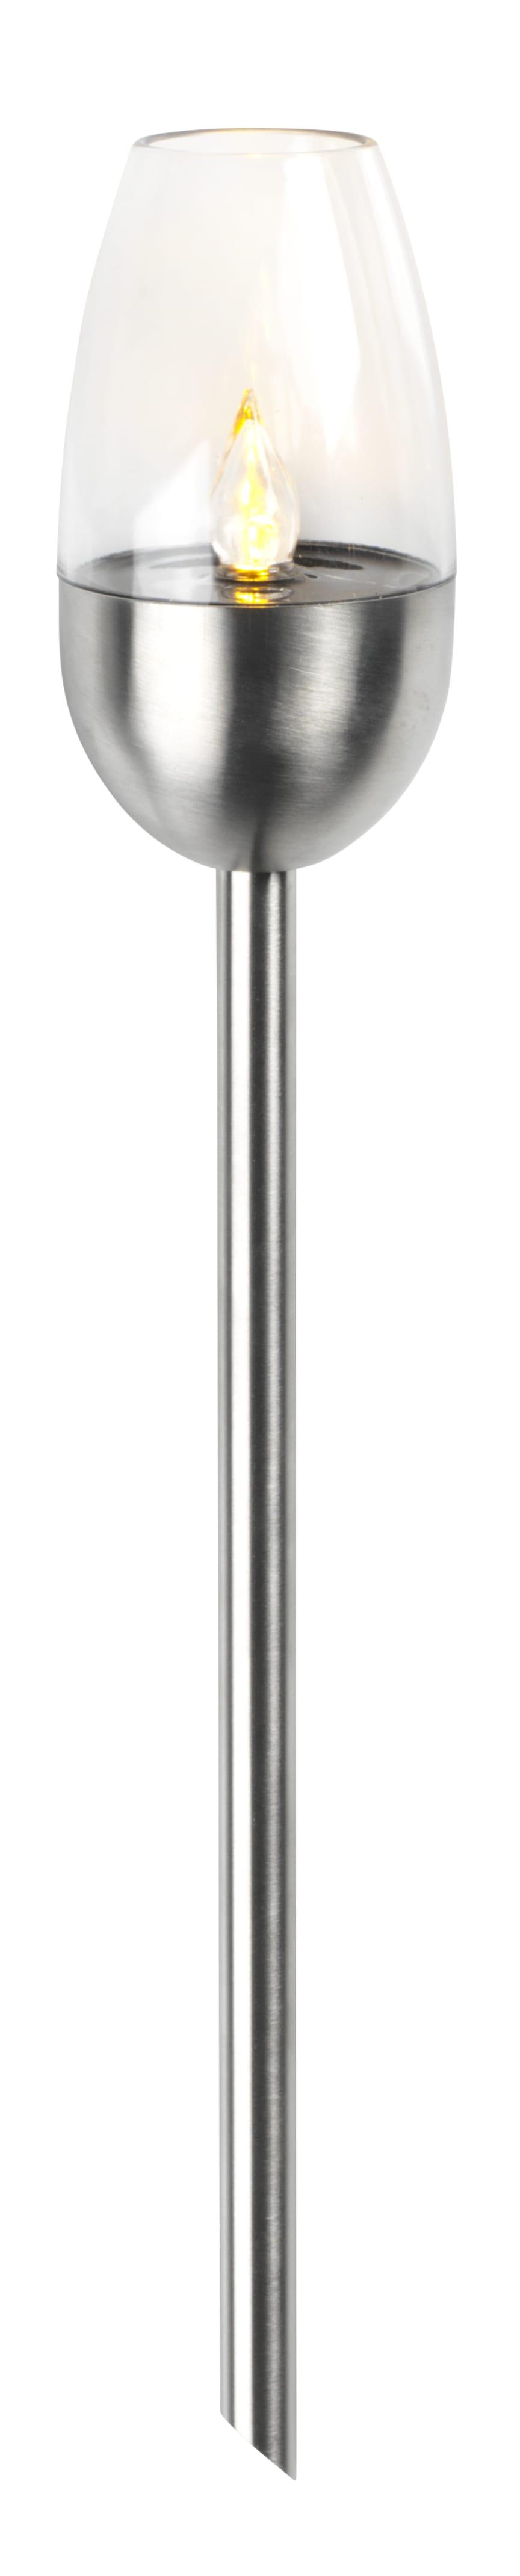 Solcellslampa SLAPPA Ø6xH39